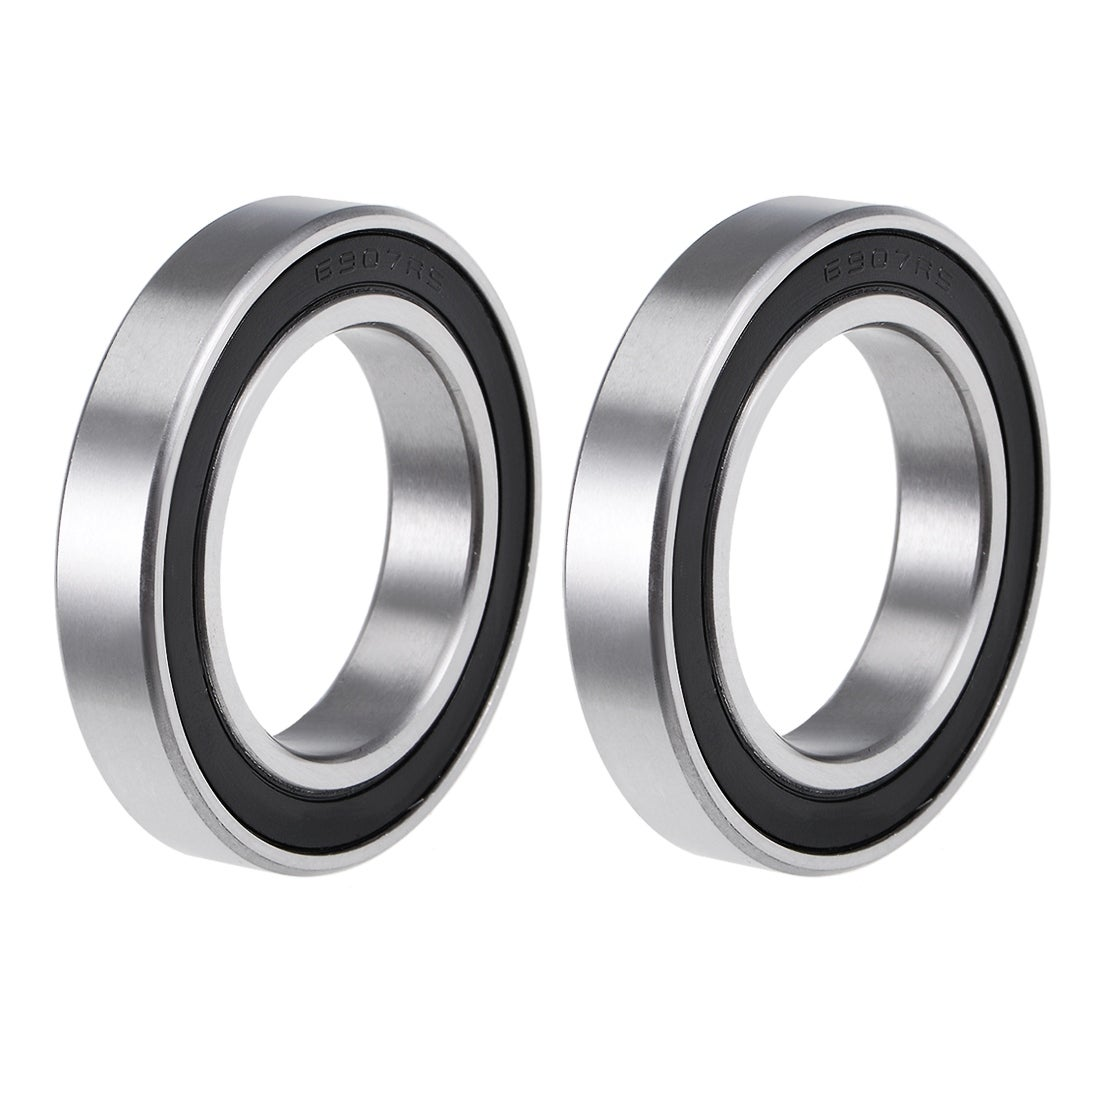 6907-2RS Bearing Deep Groove 6907-2RS Ball Bearings